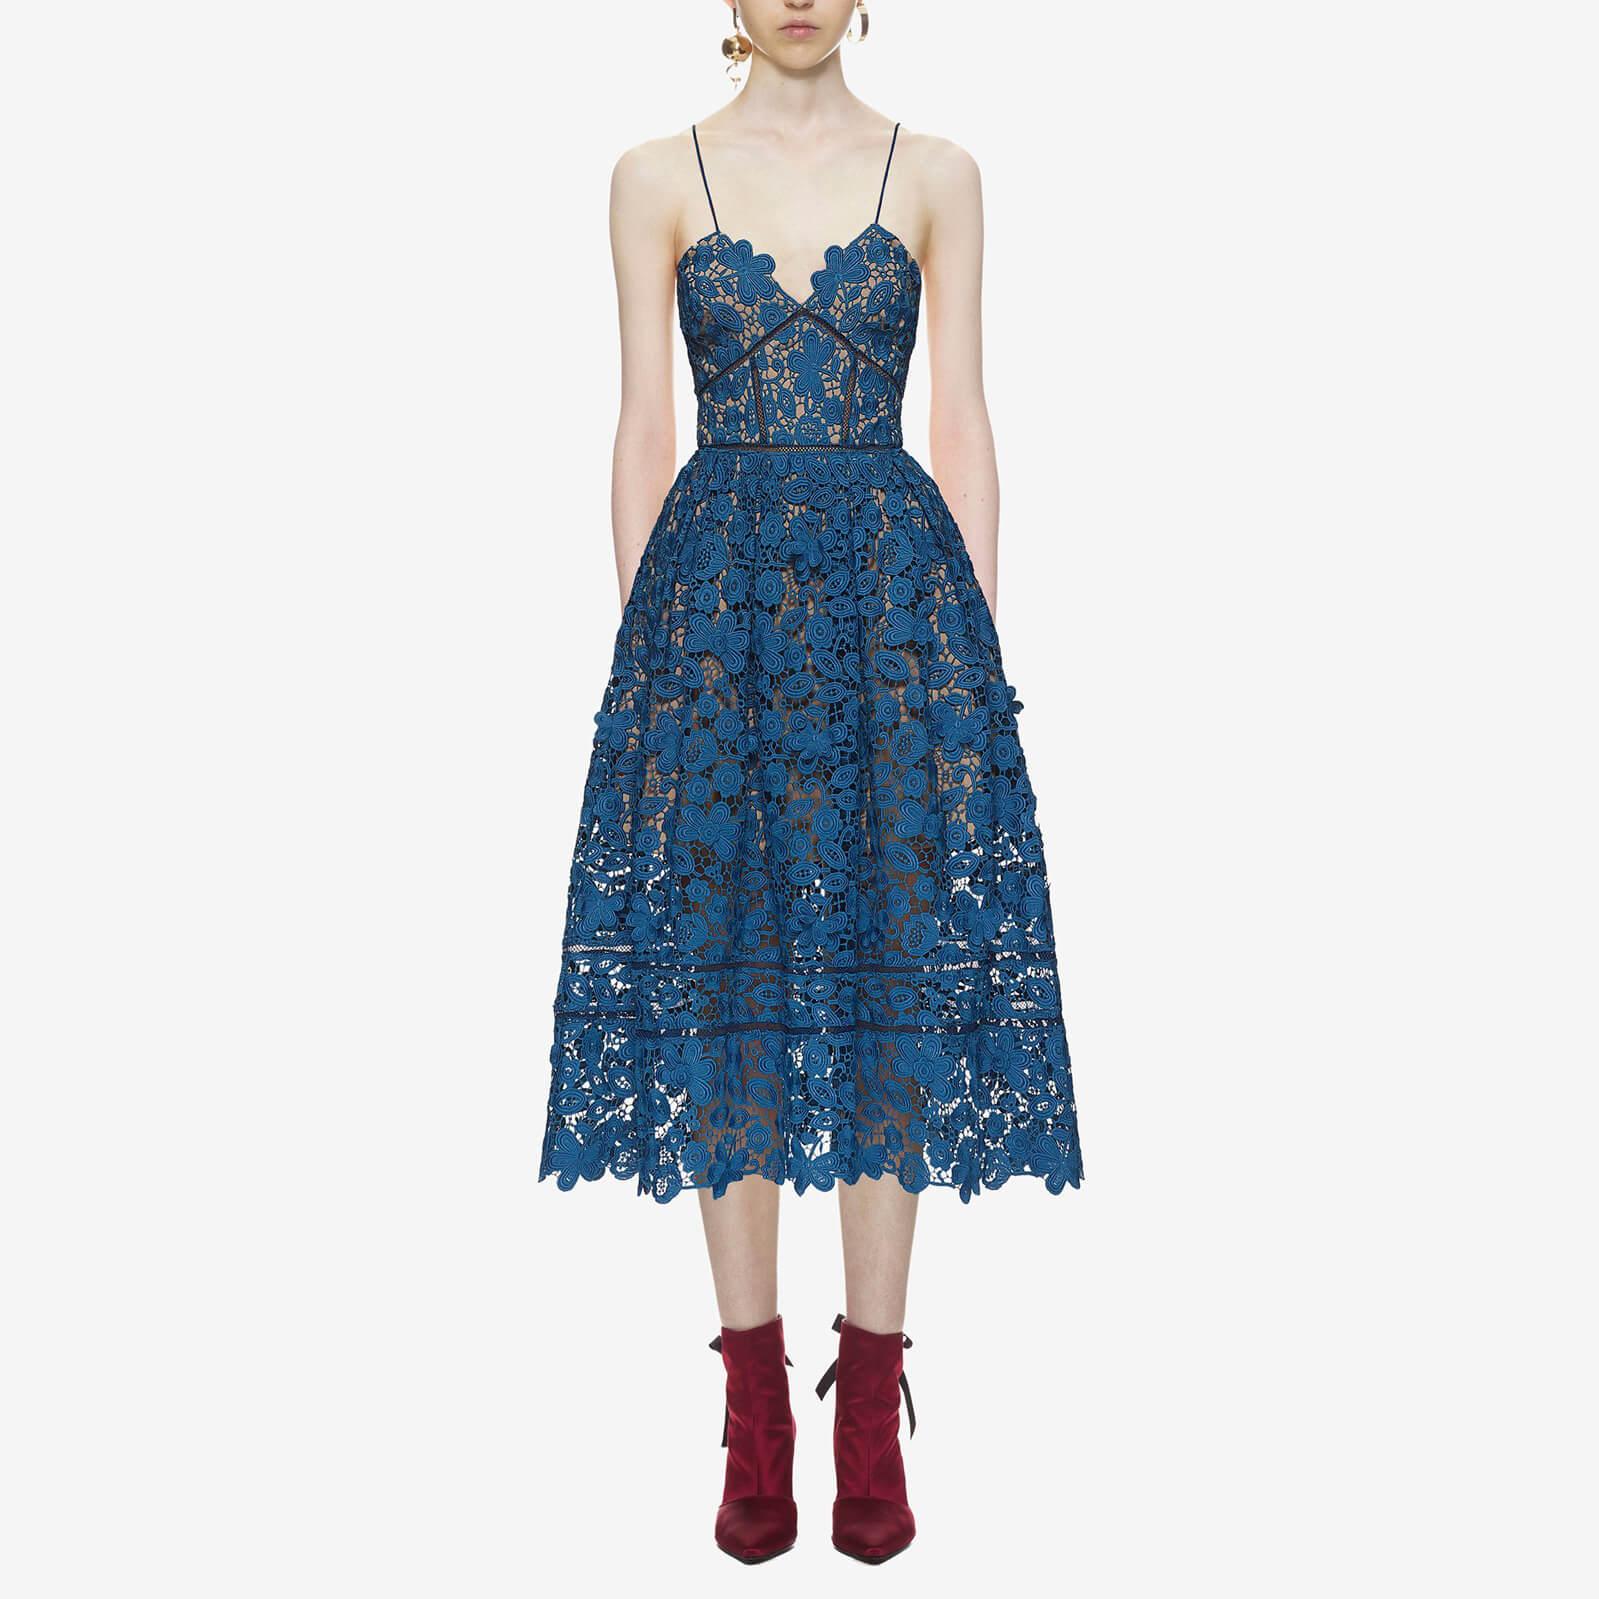 d99ce7becfe7 Self-Portrait Women's 3D Floral Azaelea Dress - Slate Blue - Free UK  Delivery over £50